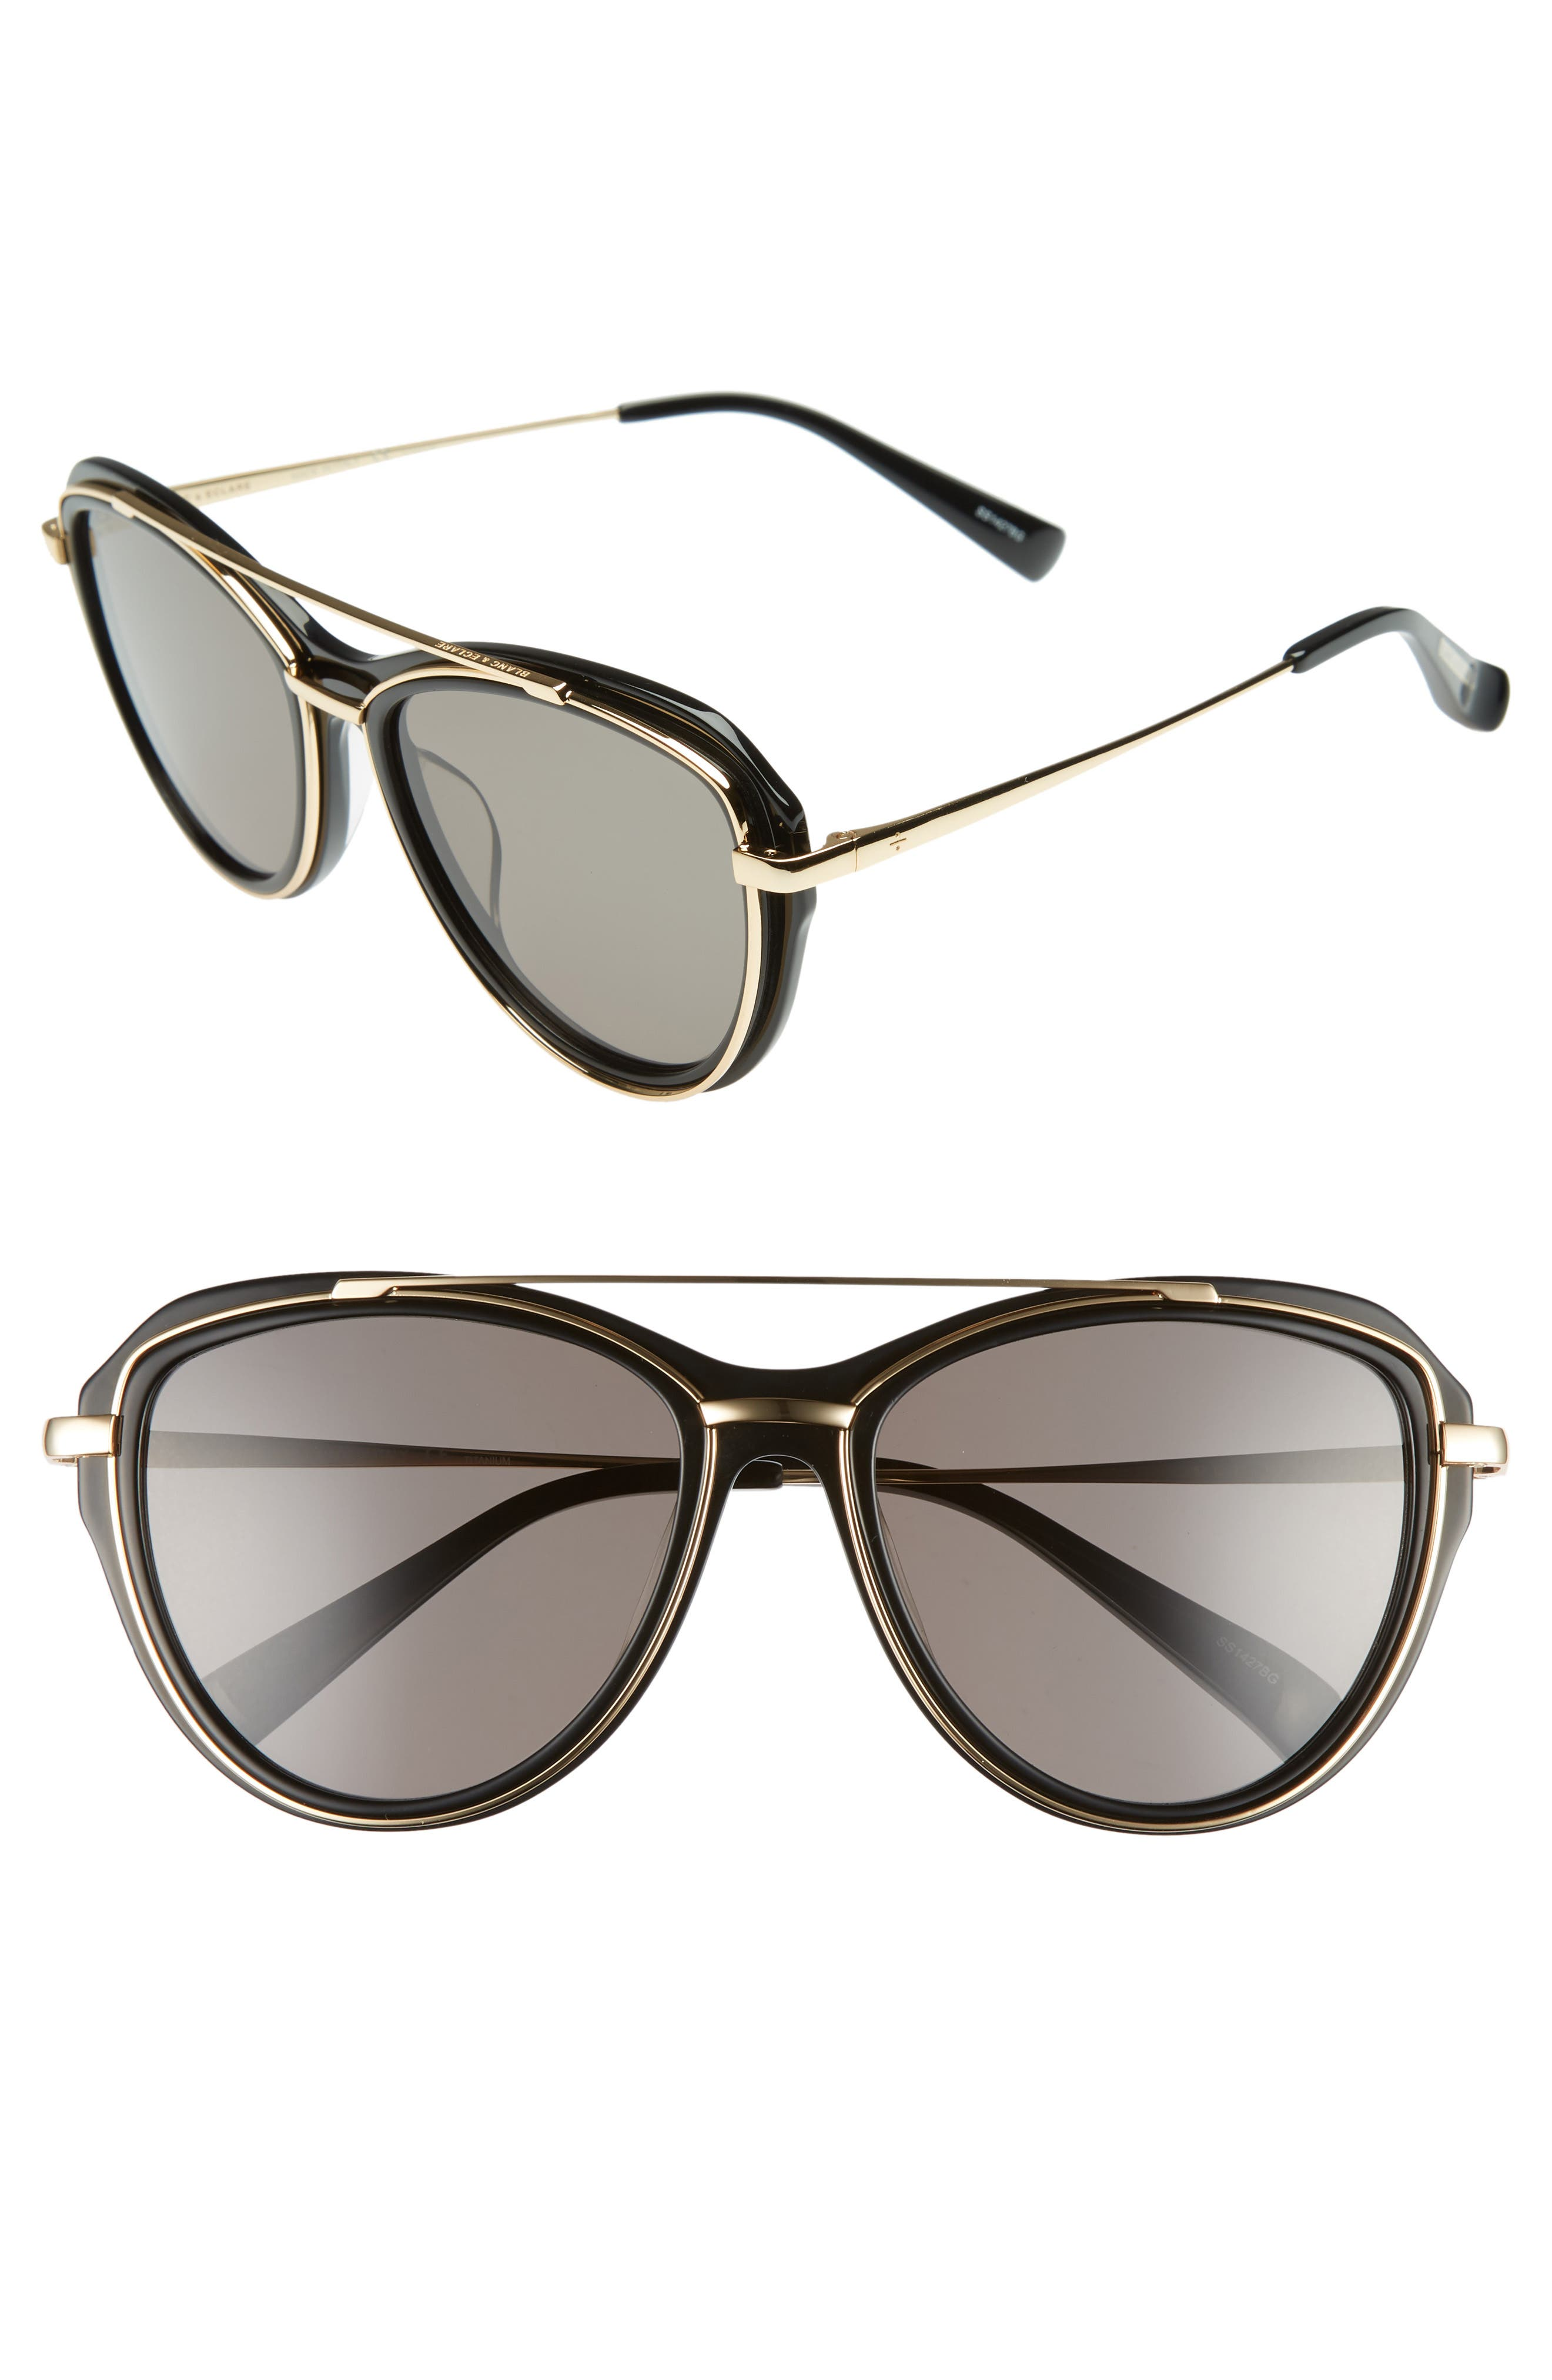 BLANC & ECLARE Marrakesh 57mm Aviator Sunglasses,                         Main,                         color, 001